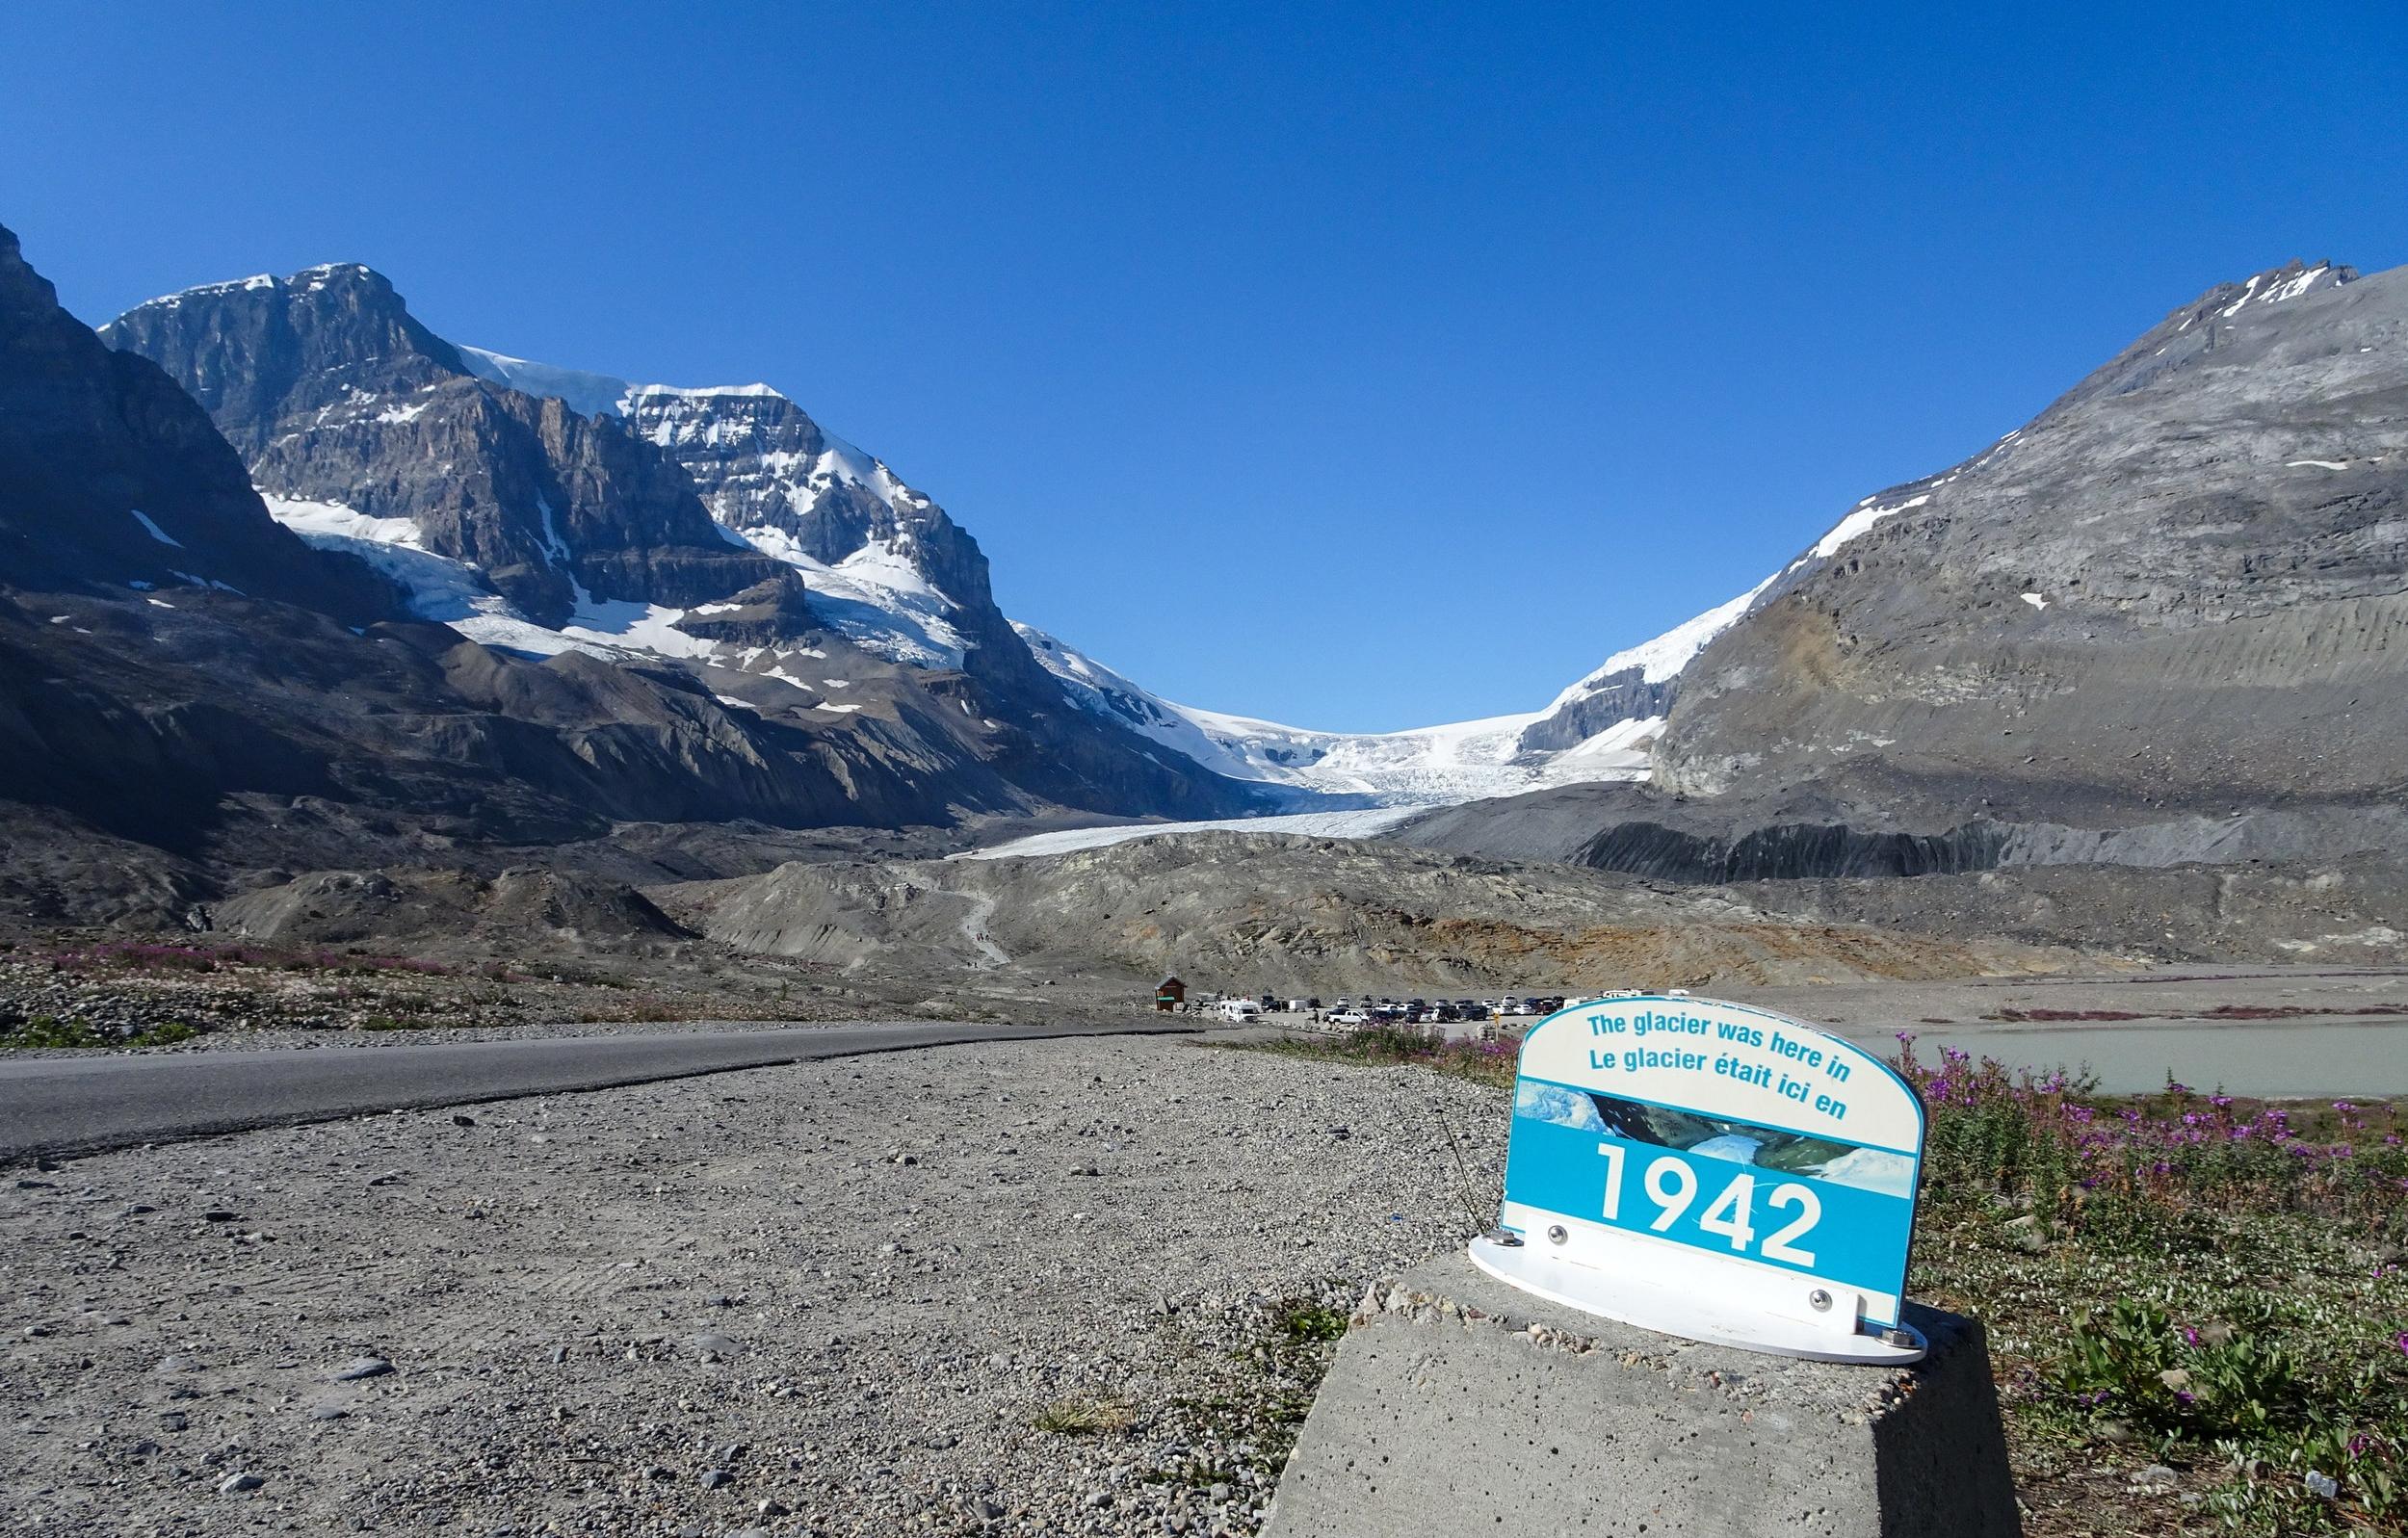 AthabascaGlacier_Hike.jpg